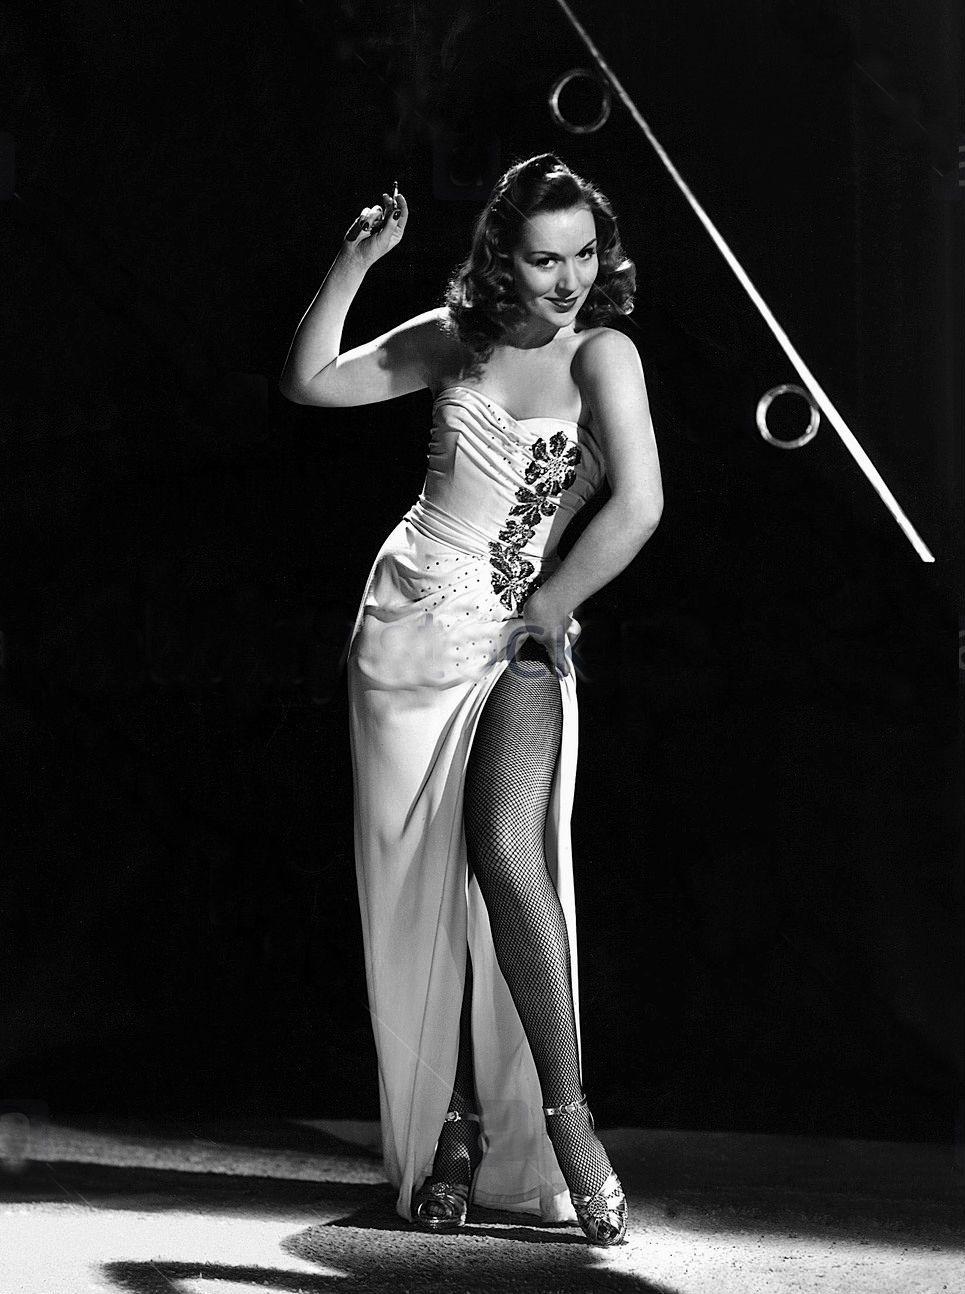 foto Rene Ray, Countess of Midleton